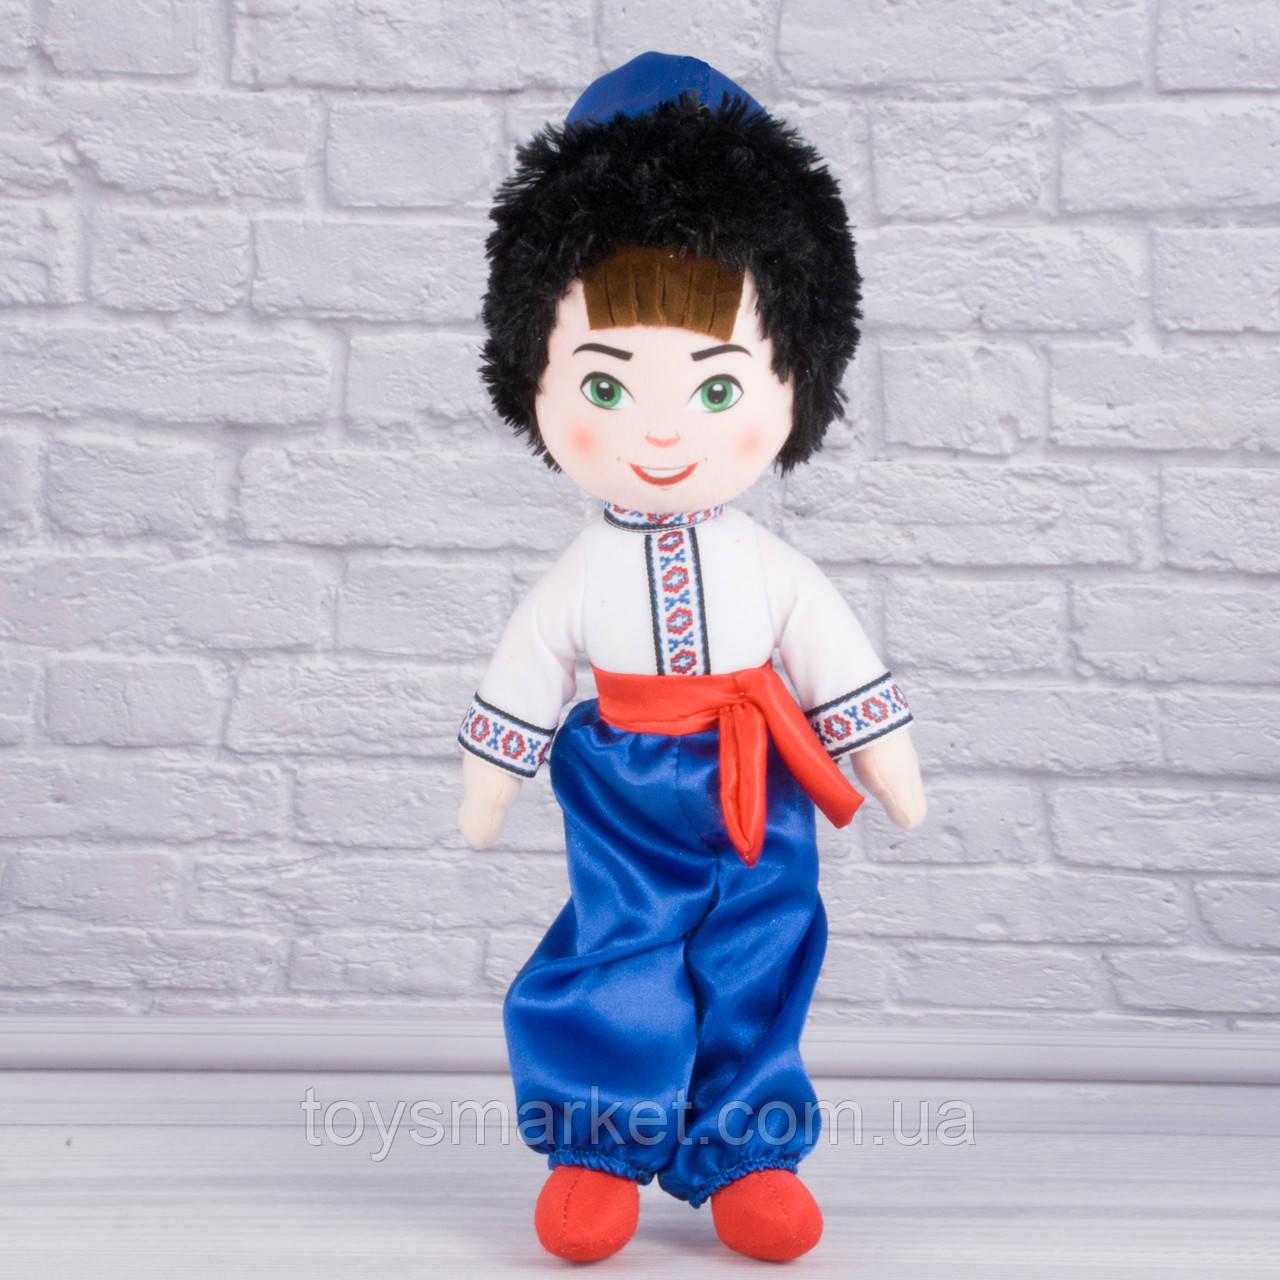 "Игрушка ""Козак"", мальчик кукла Украинец, 44 см."